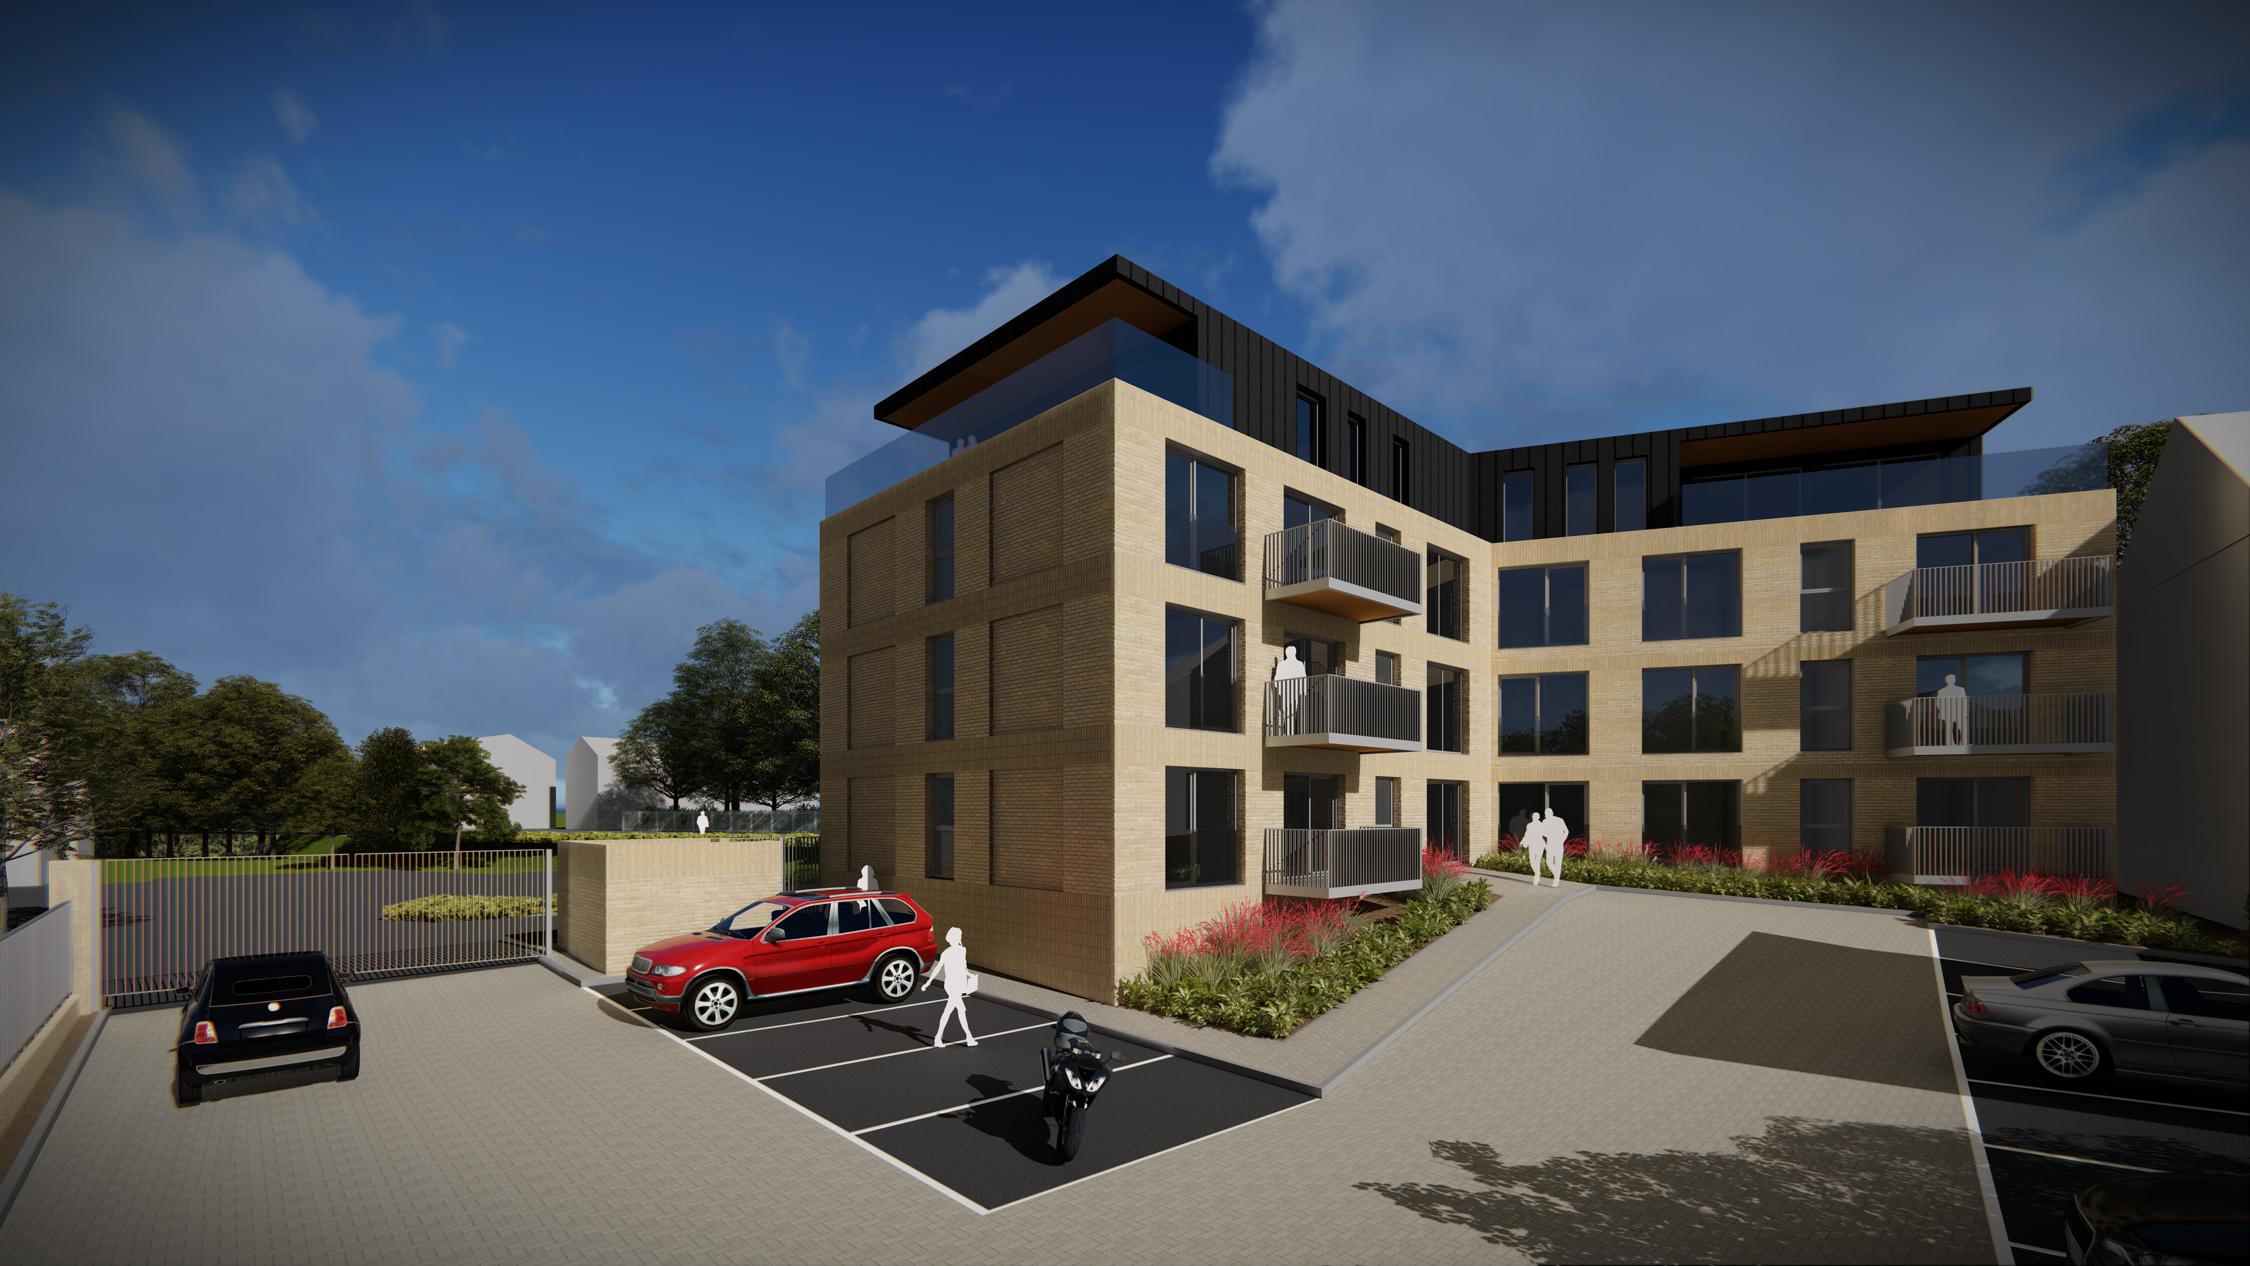 Kedleston_Road_Apartments_Rear_Carpark.jpg